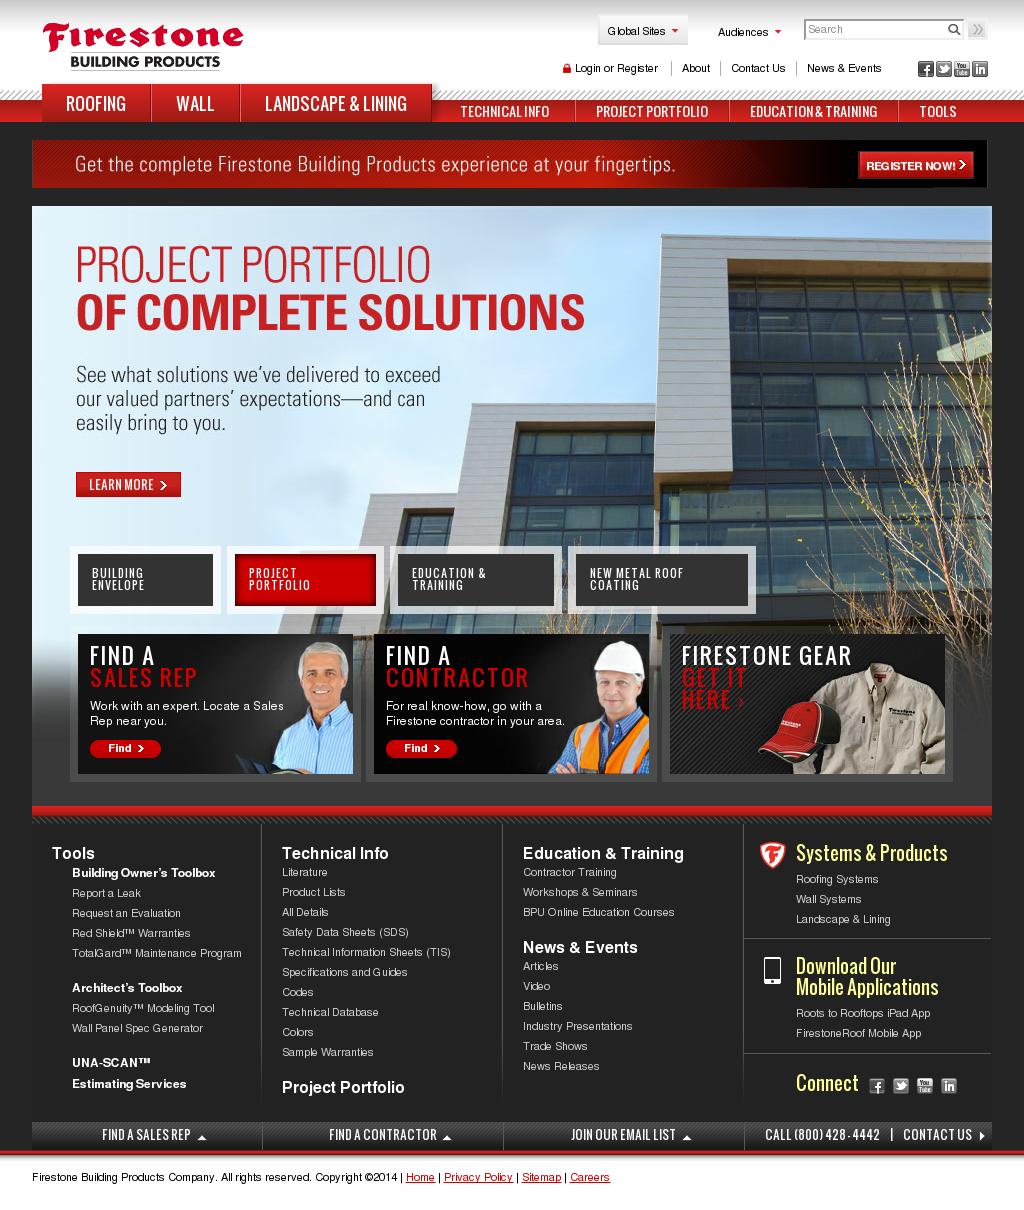 firestone building products company profile owler. Black Bedroom Furniture Sets. Home Design Ideas